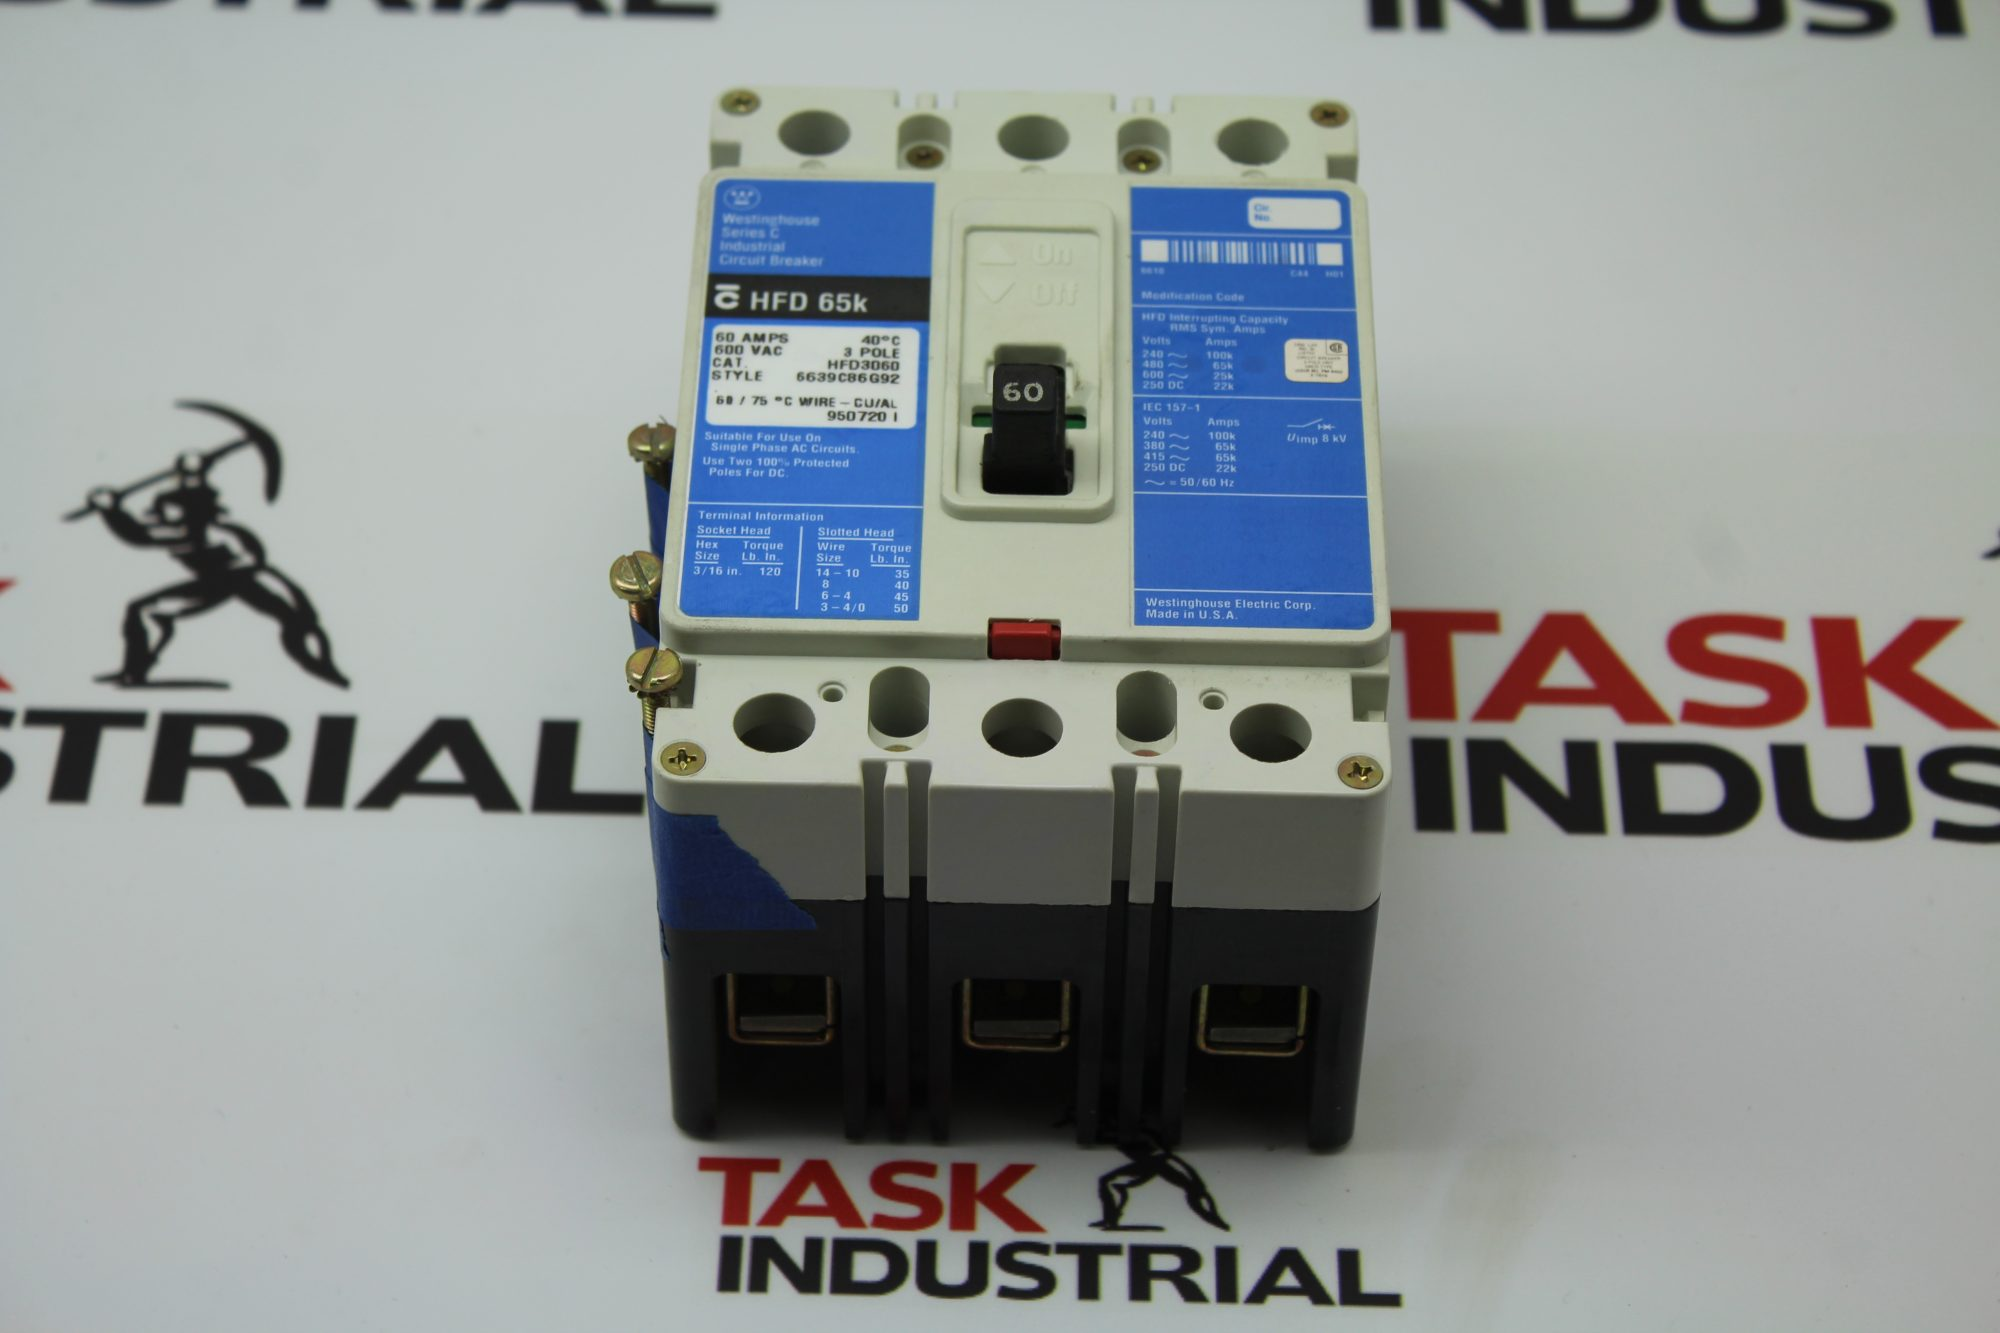 Westinghouse Series C HFD 65k CAT HFD3060 Circuit Breaker